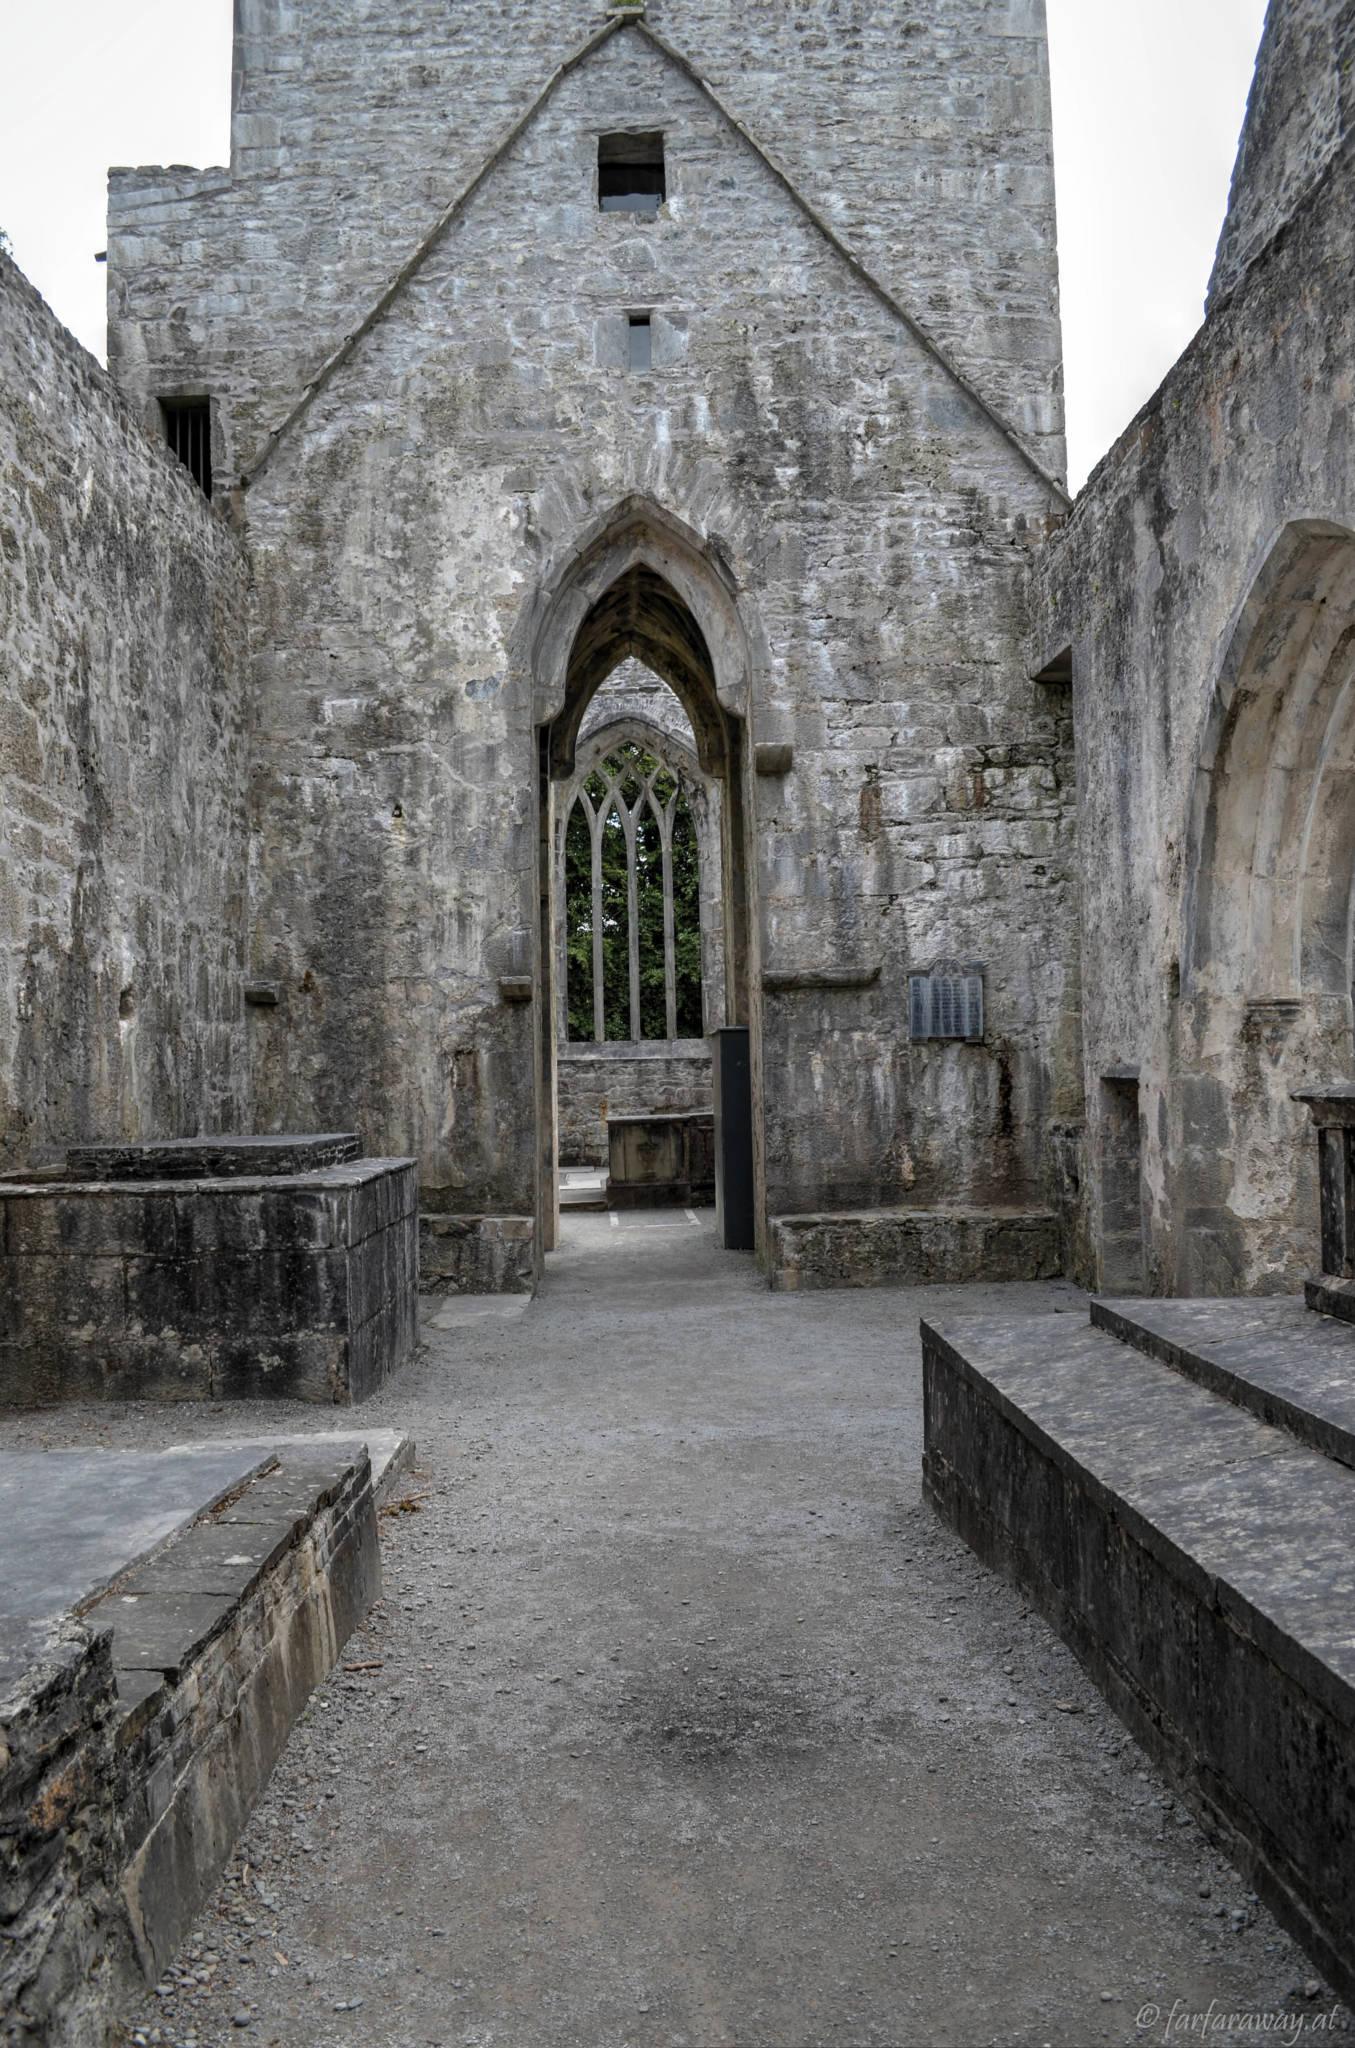 In the monastery, Muckross Abbey